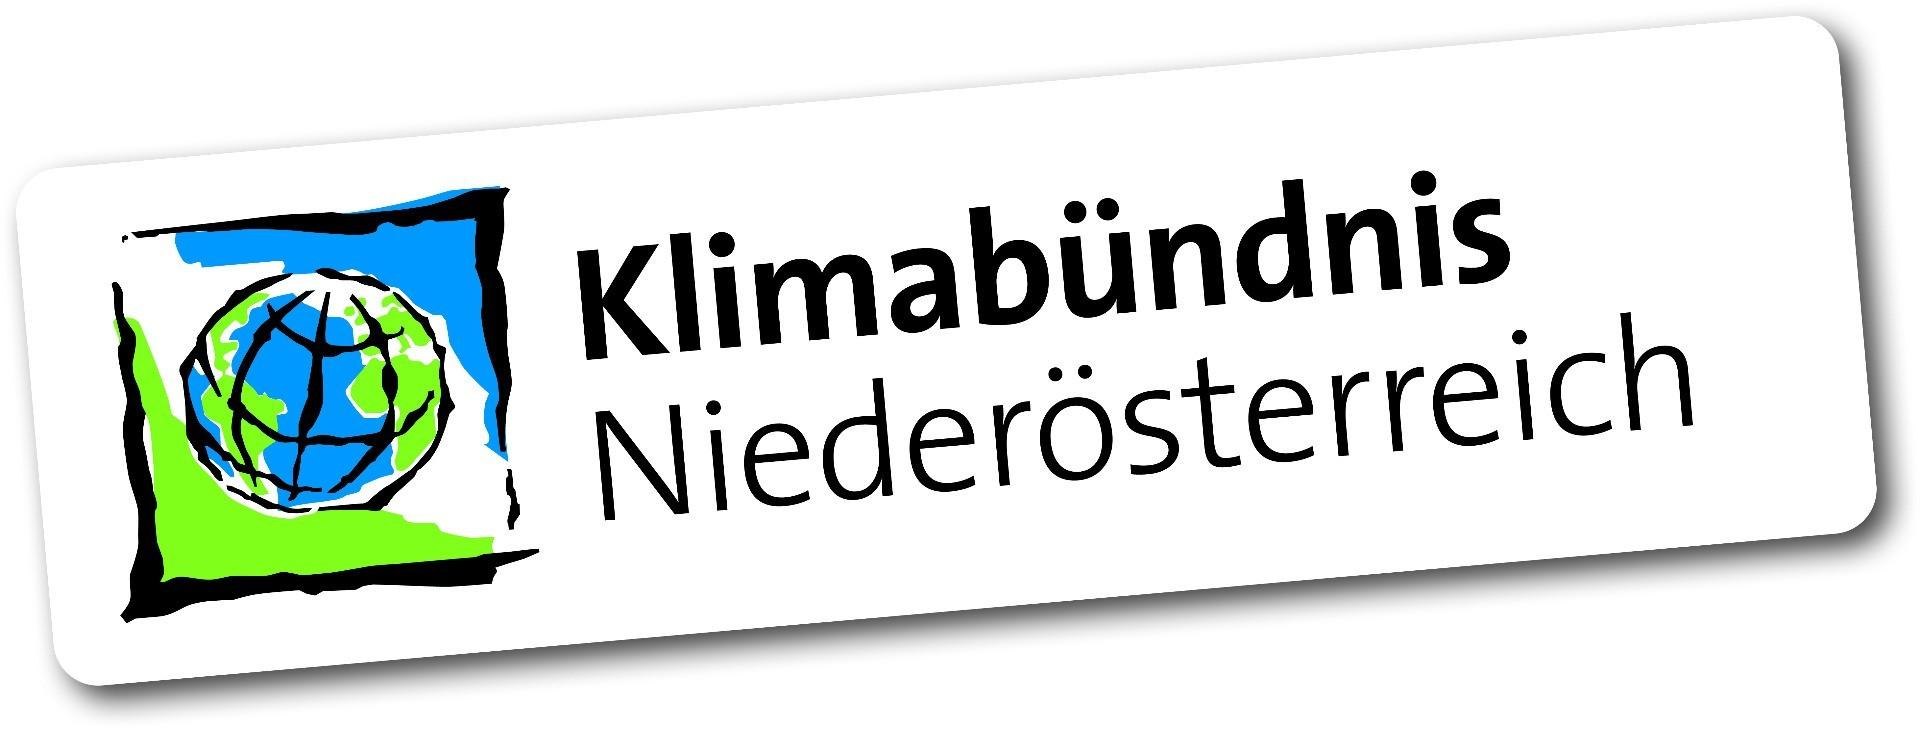 kbu_logo_noe.jpg